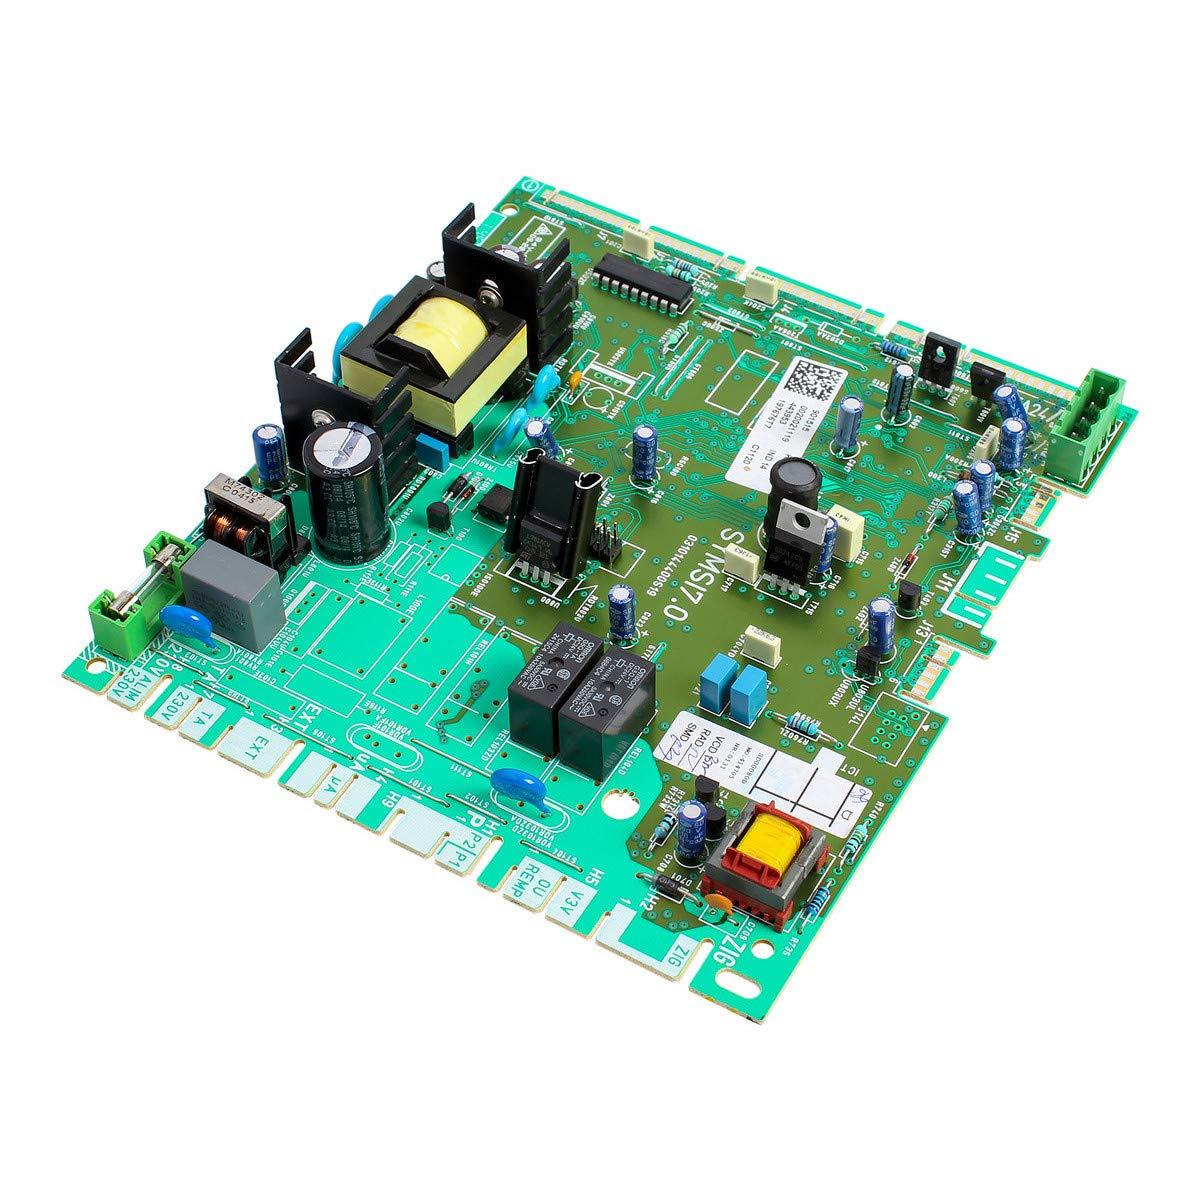 GLOWWORM 24CXI 30CXI 38CXI PRINTED CIRCUIT BOARD PCB 2000802731 WAS ...